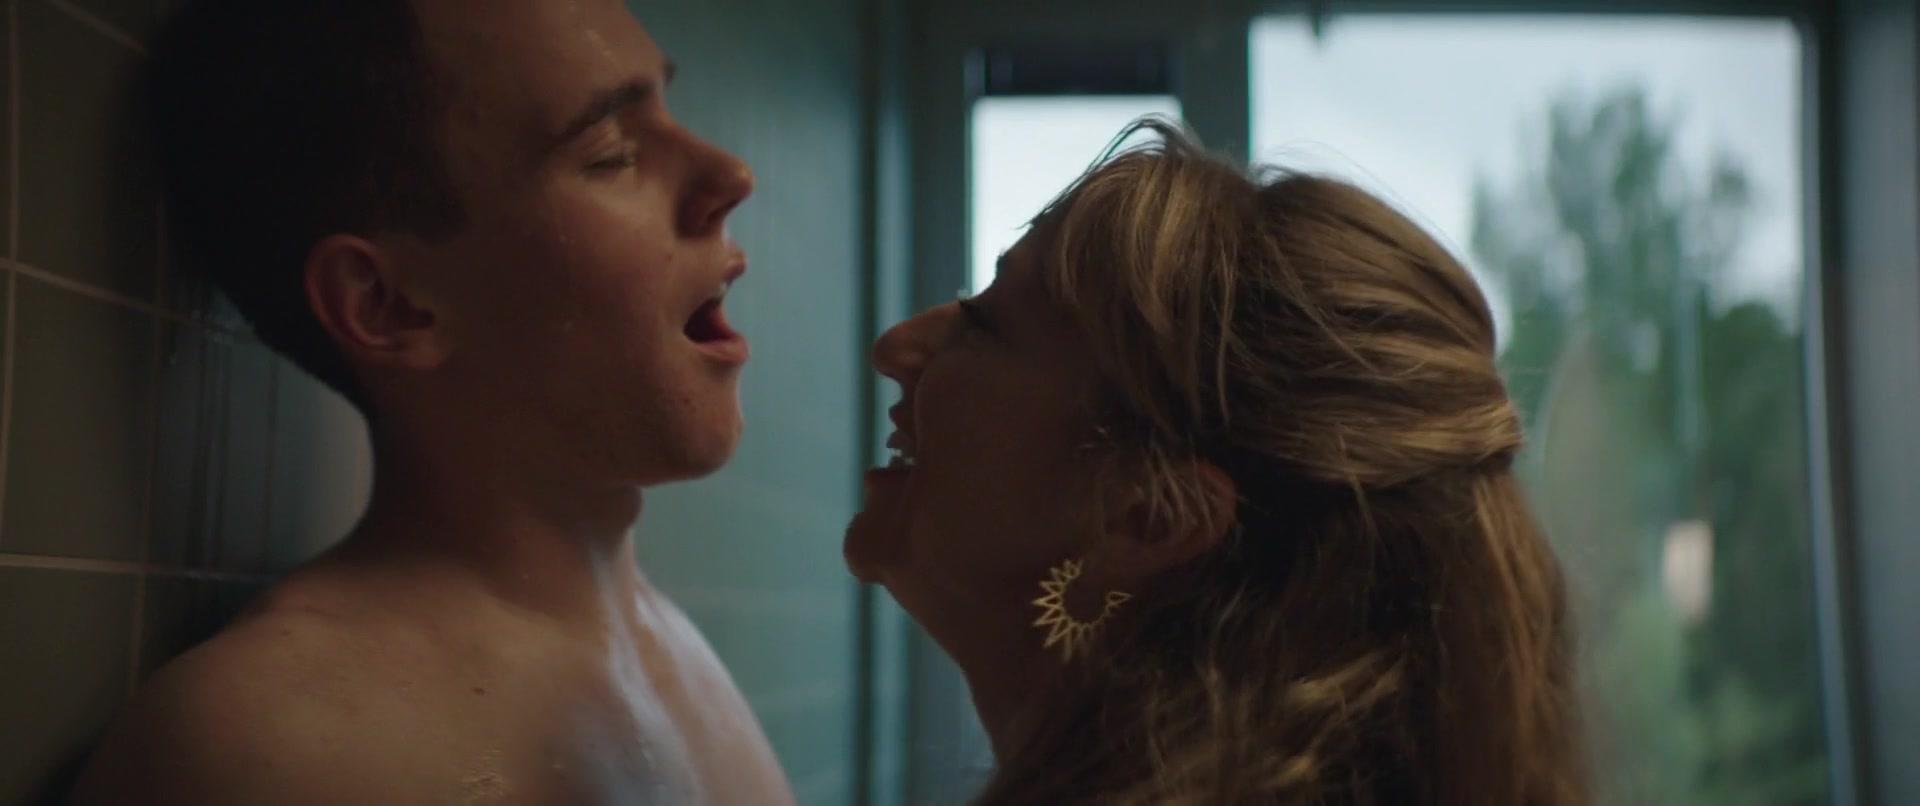 Andrea Serra Porn sexy andrea braein hovig naked - en affære (2018) video